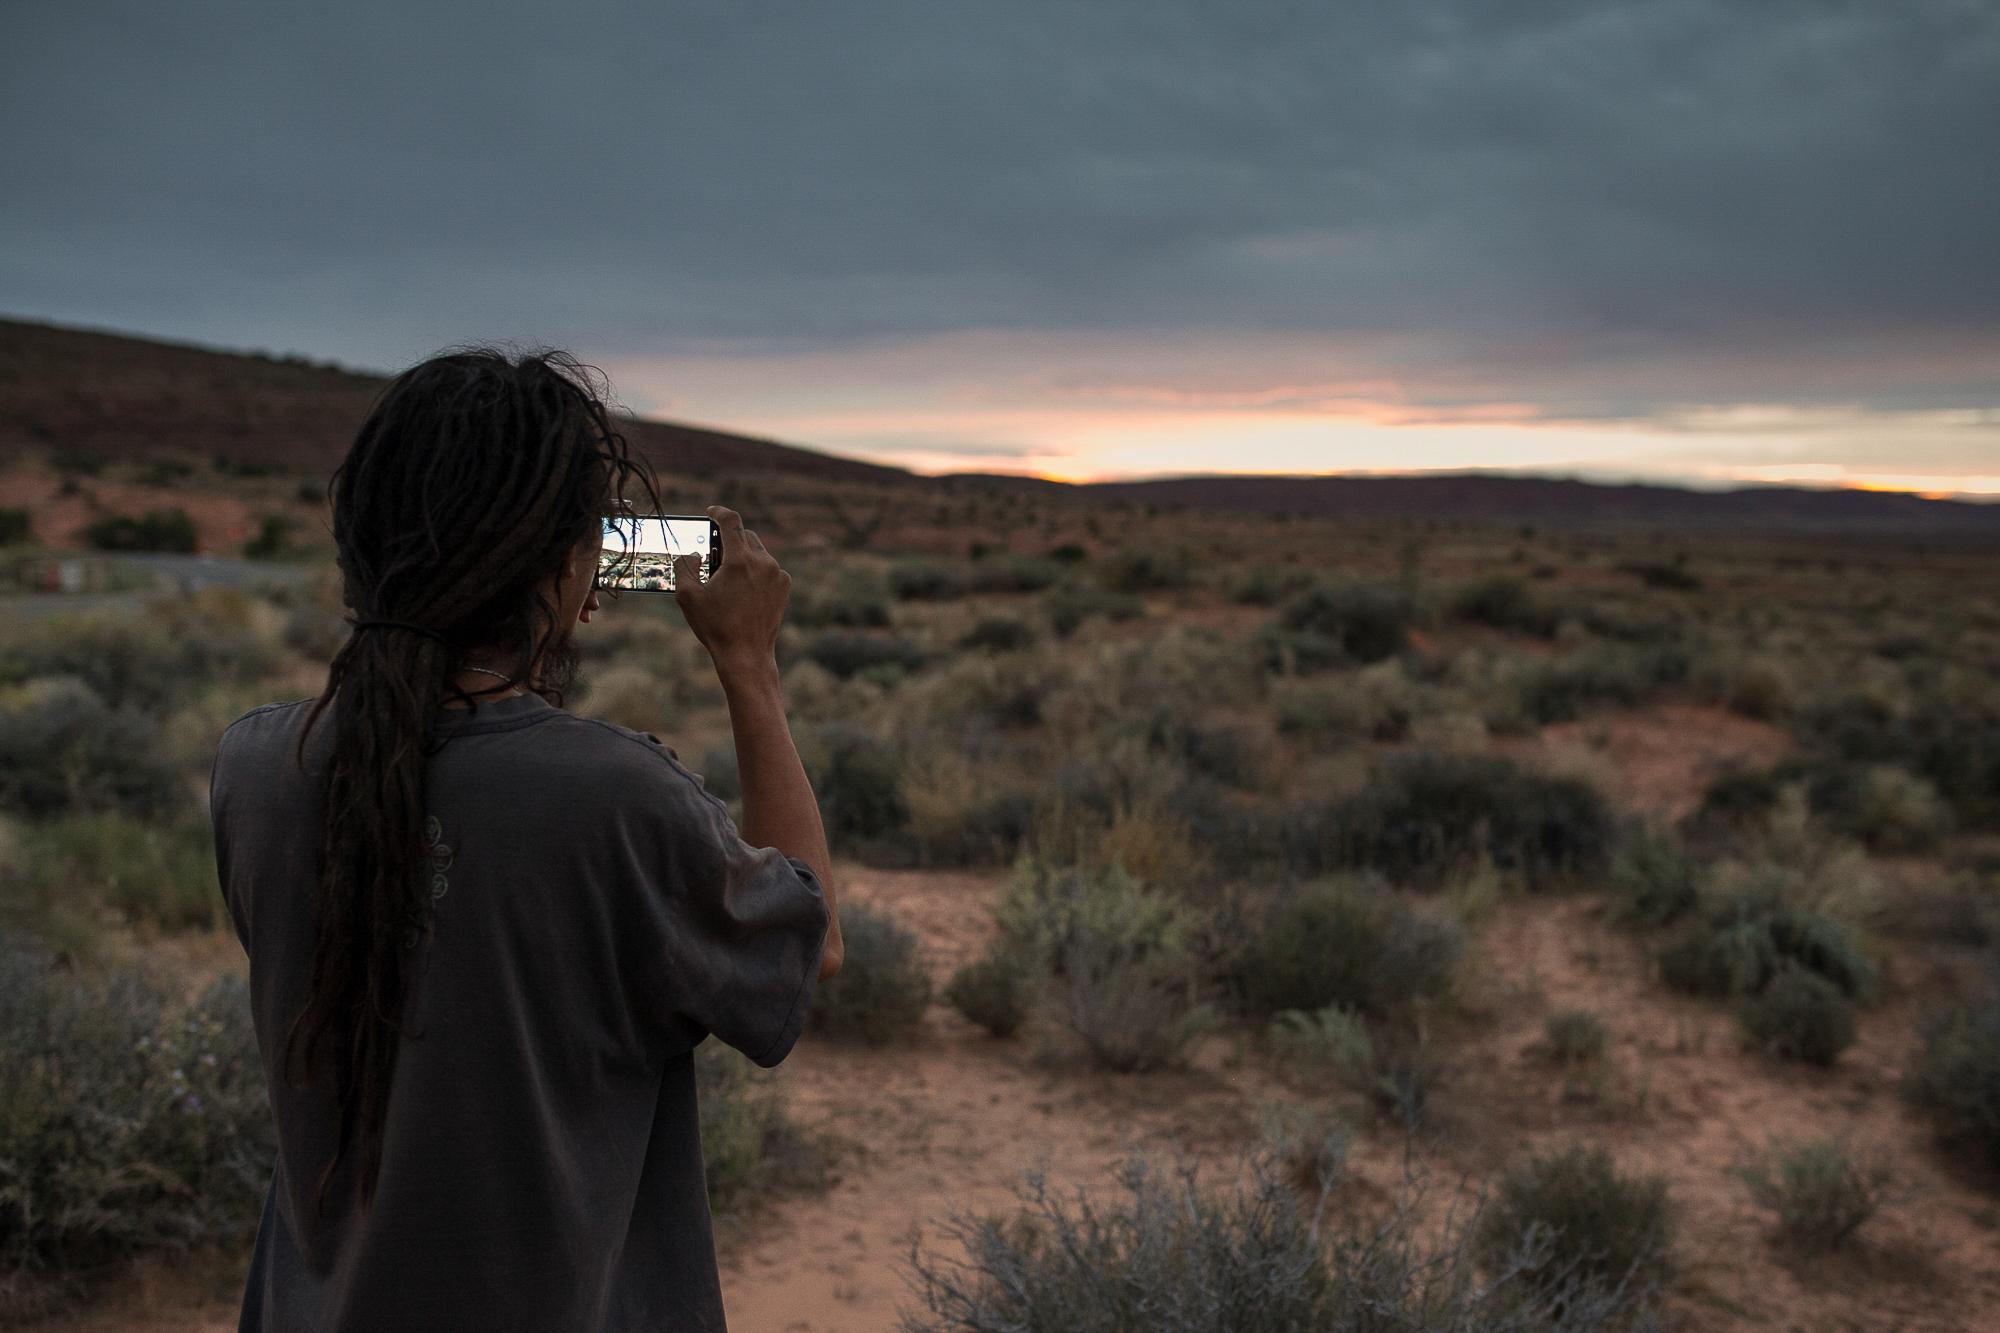 065Travel_Adventure_Outdoor_Photography_Outlive_Creative_Utah_Dessert_Road_Trip.jpg